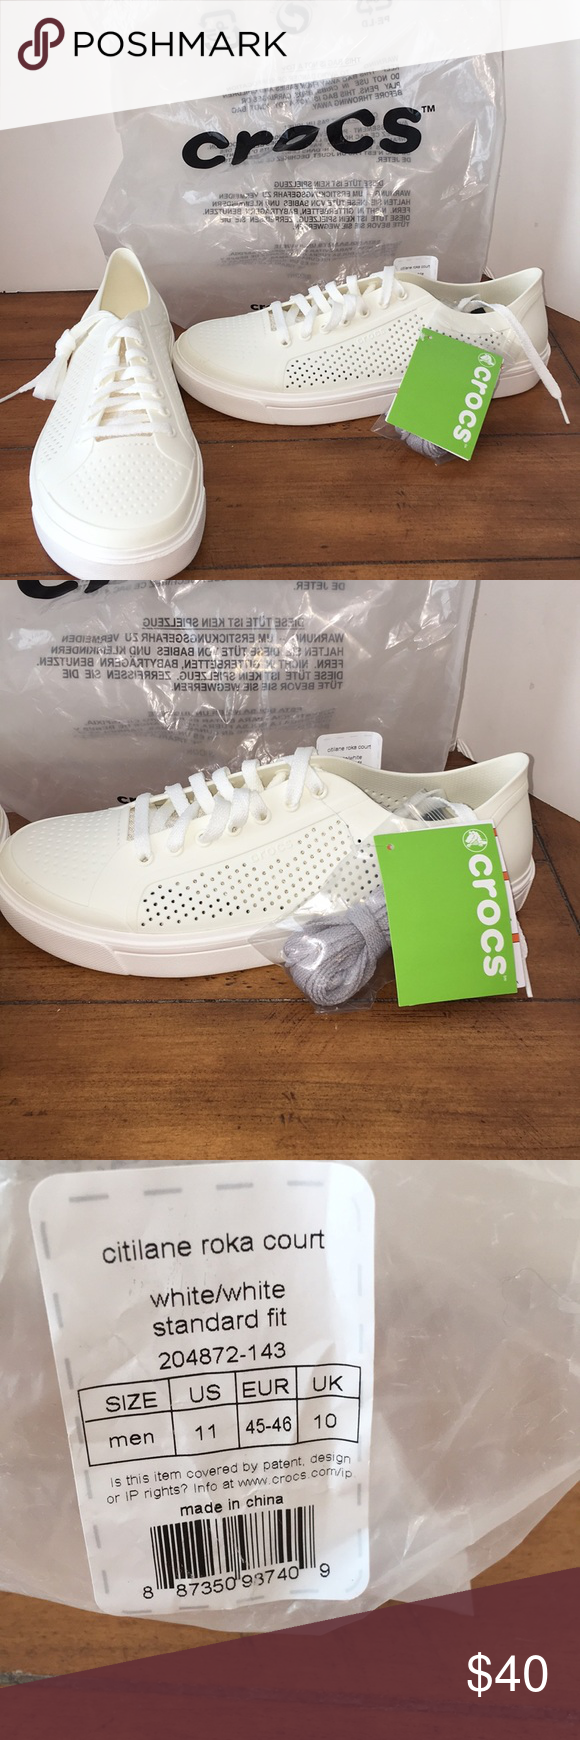 7f10a7e81594 Crocs 🐊 Citilane Roka Court NWT Crocs Citilane Roka court NWT Great  looking white sneaker shoe Comes with 2 pair of laces